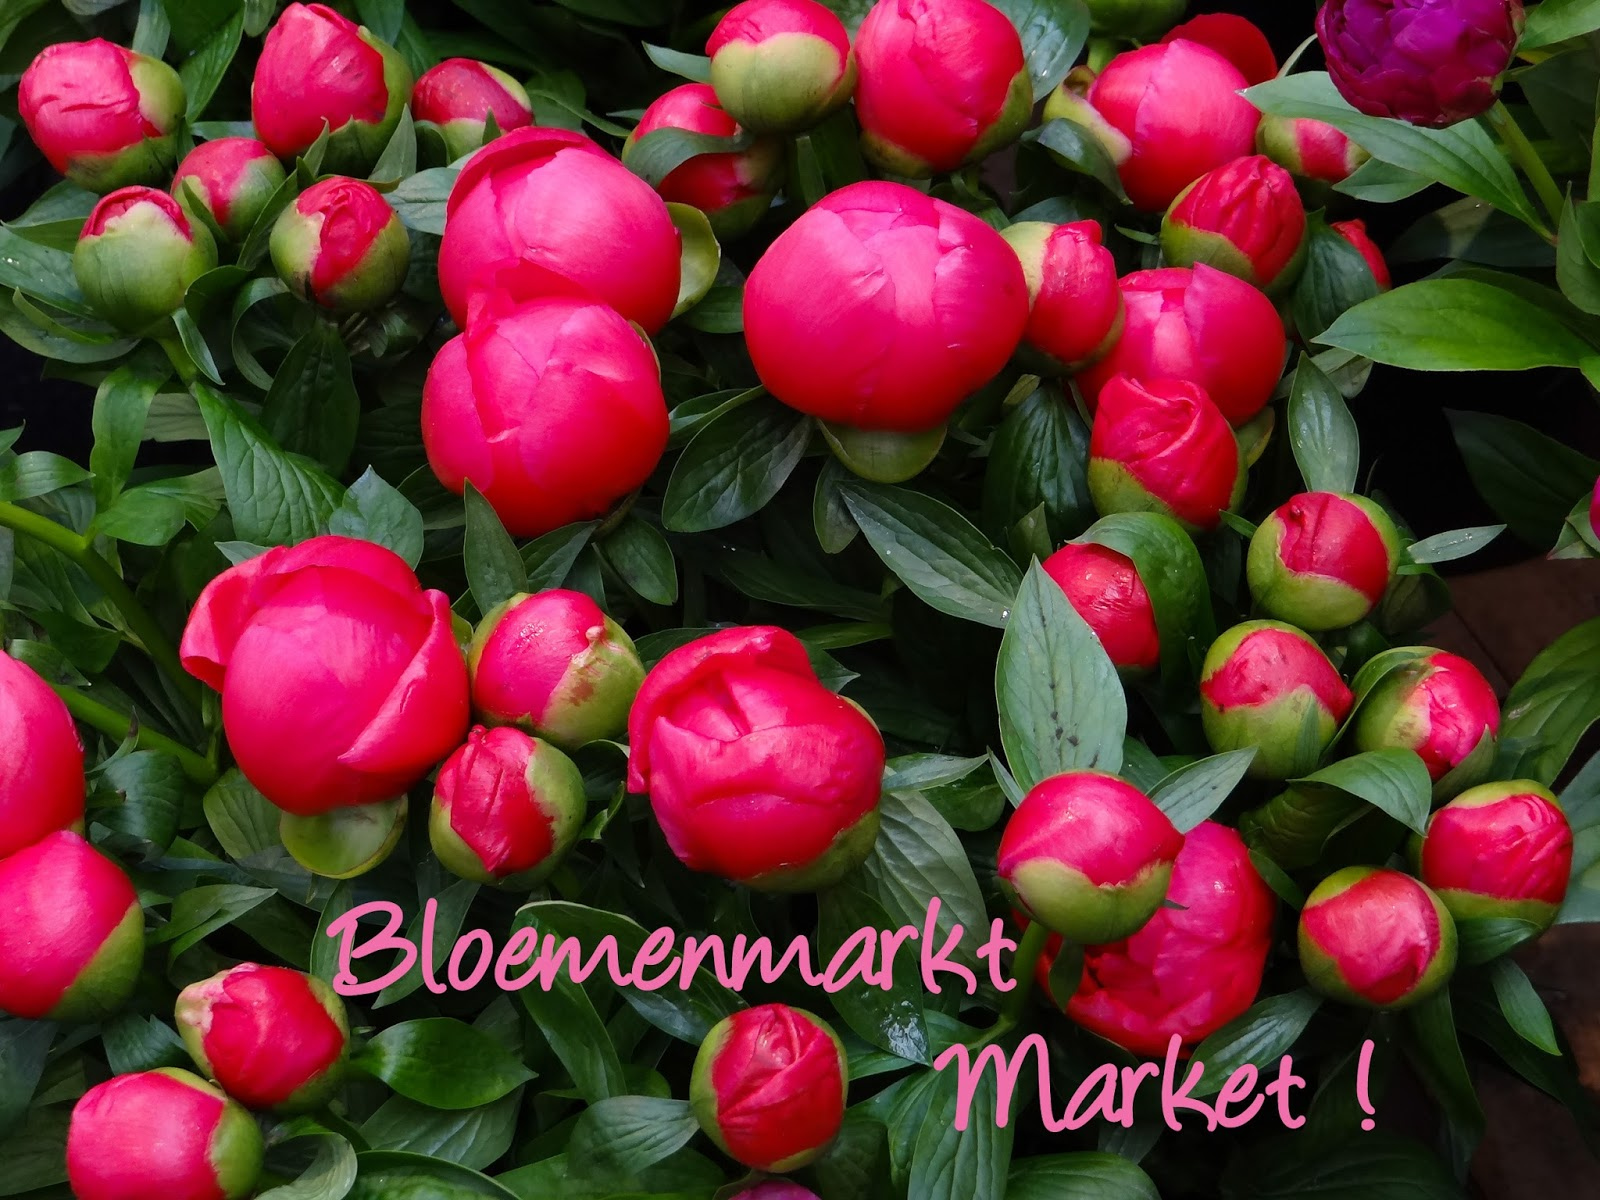 Amsterdam Bloemenmarkt Market